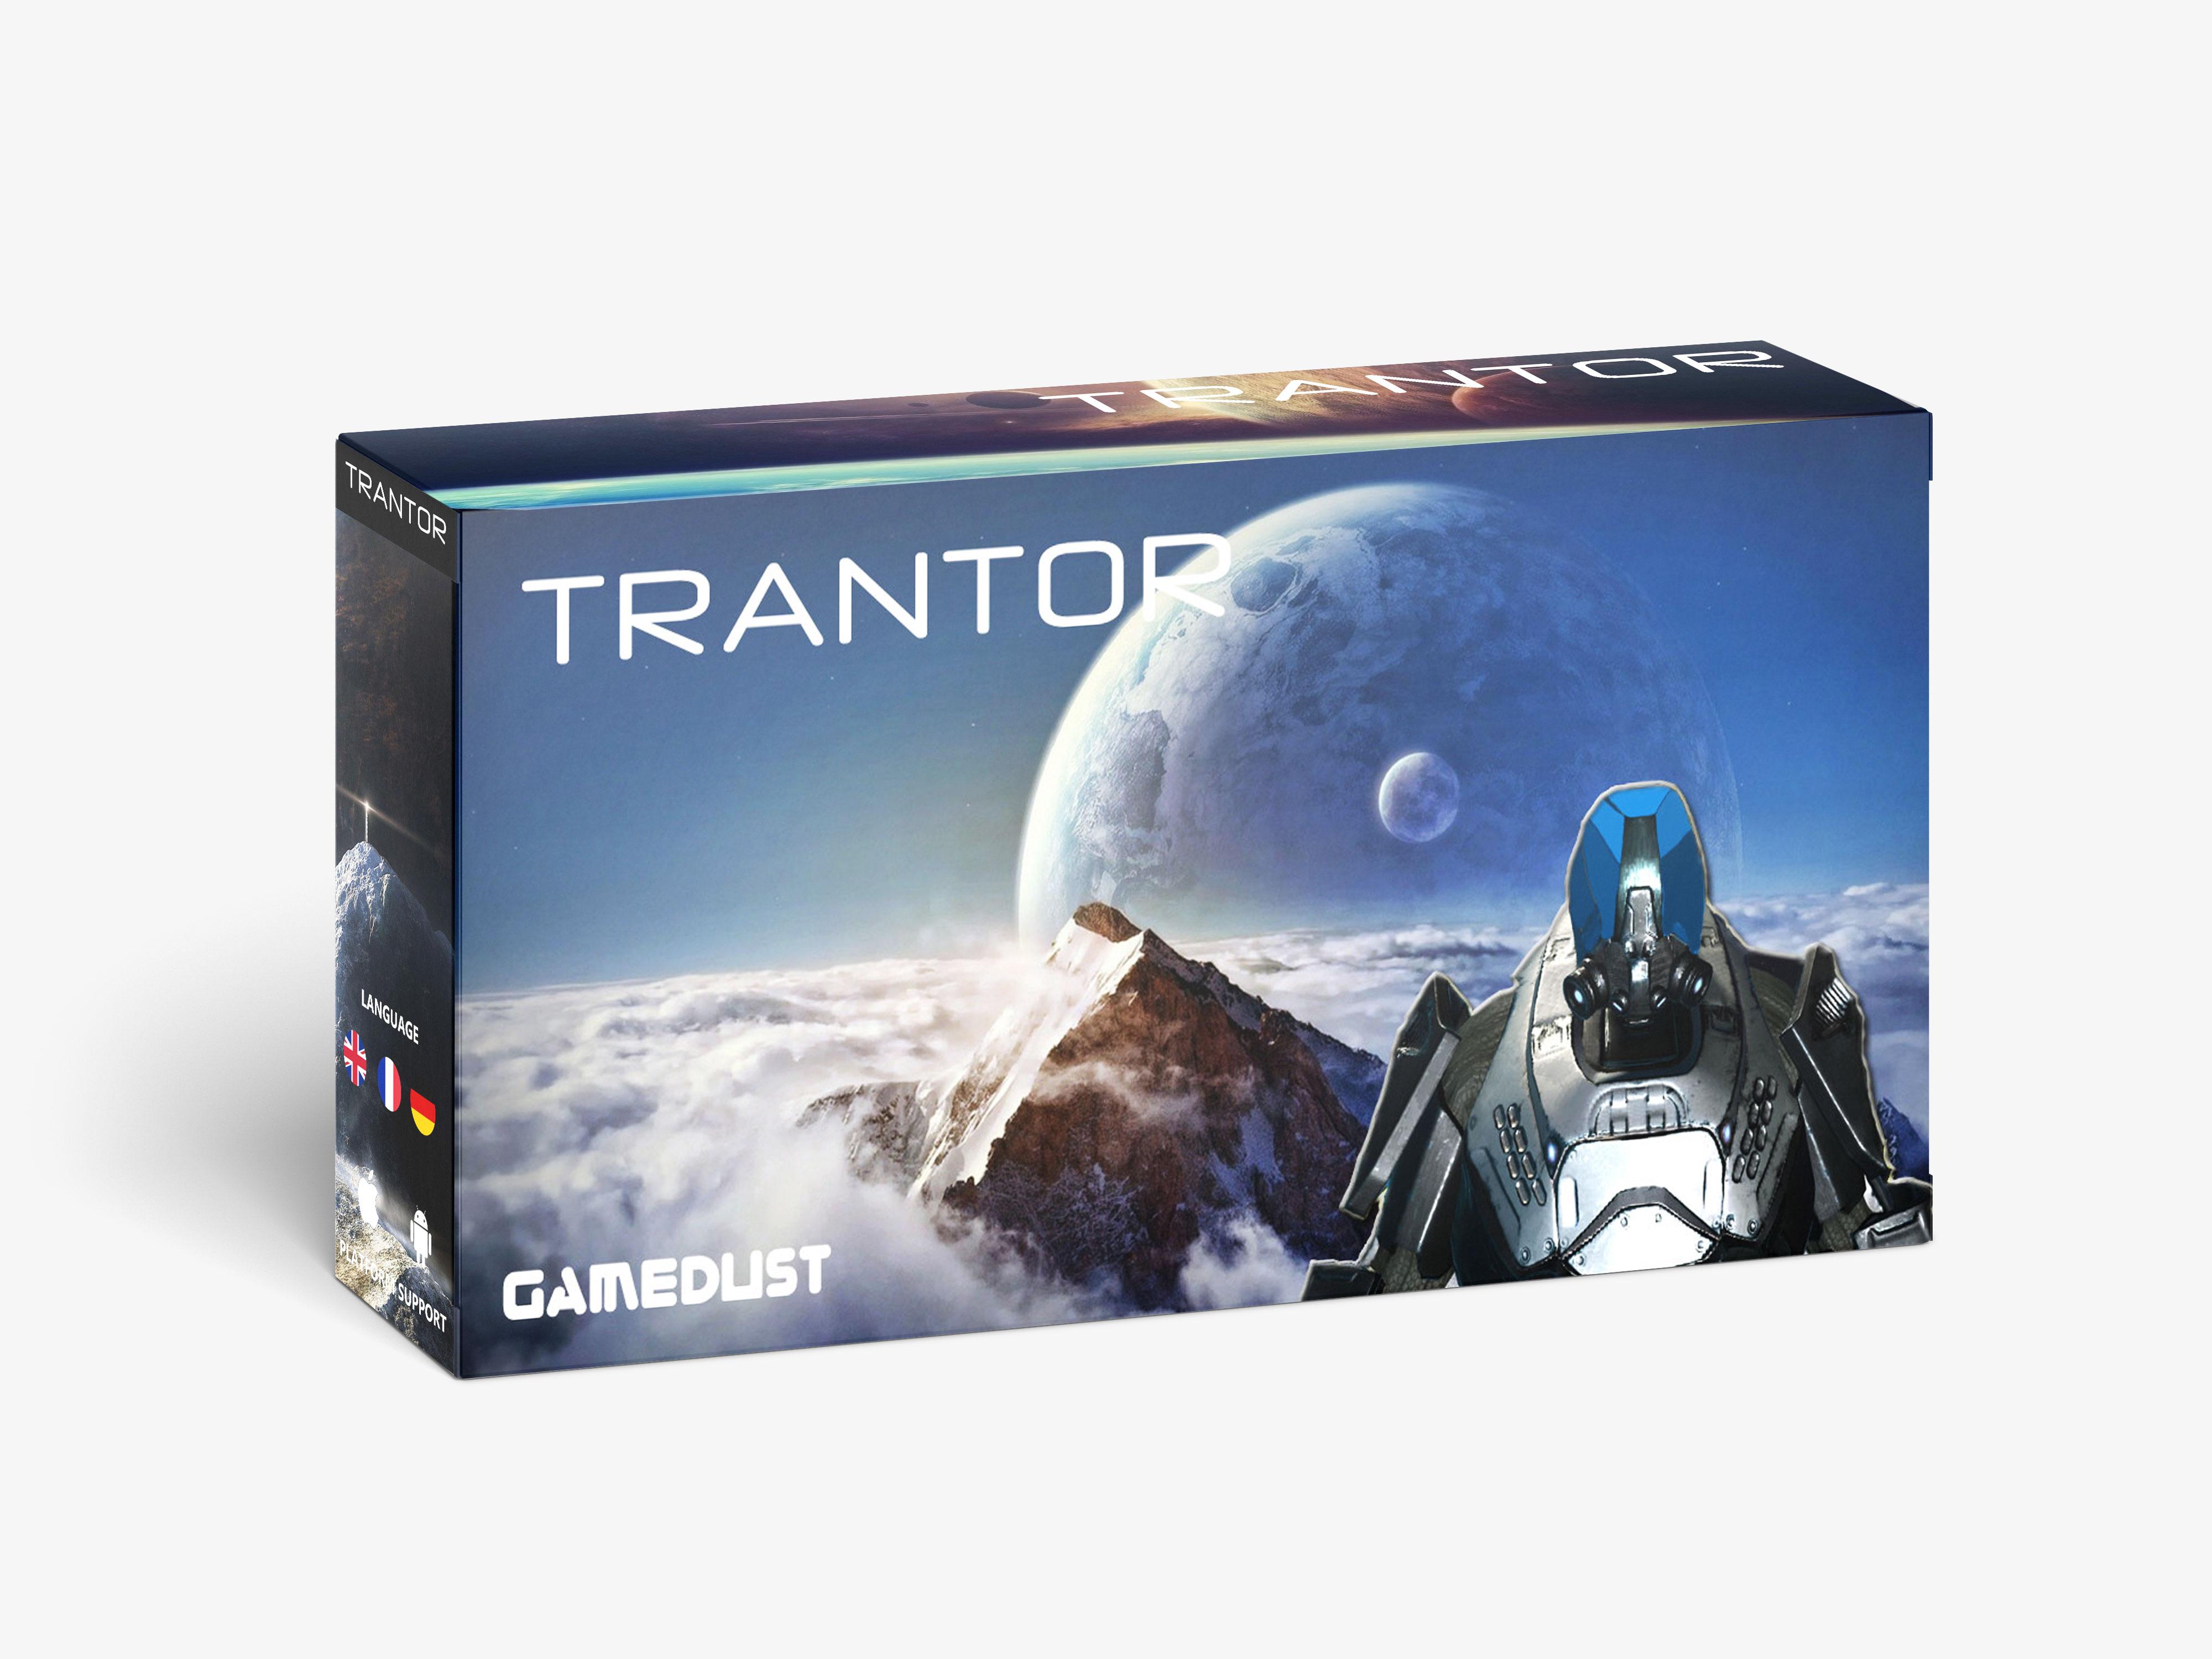 TRANTOR - Open World Mobile Game